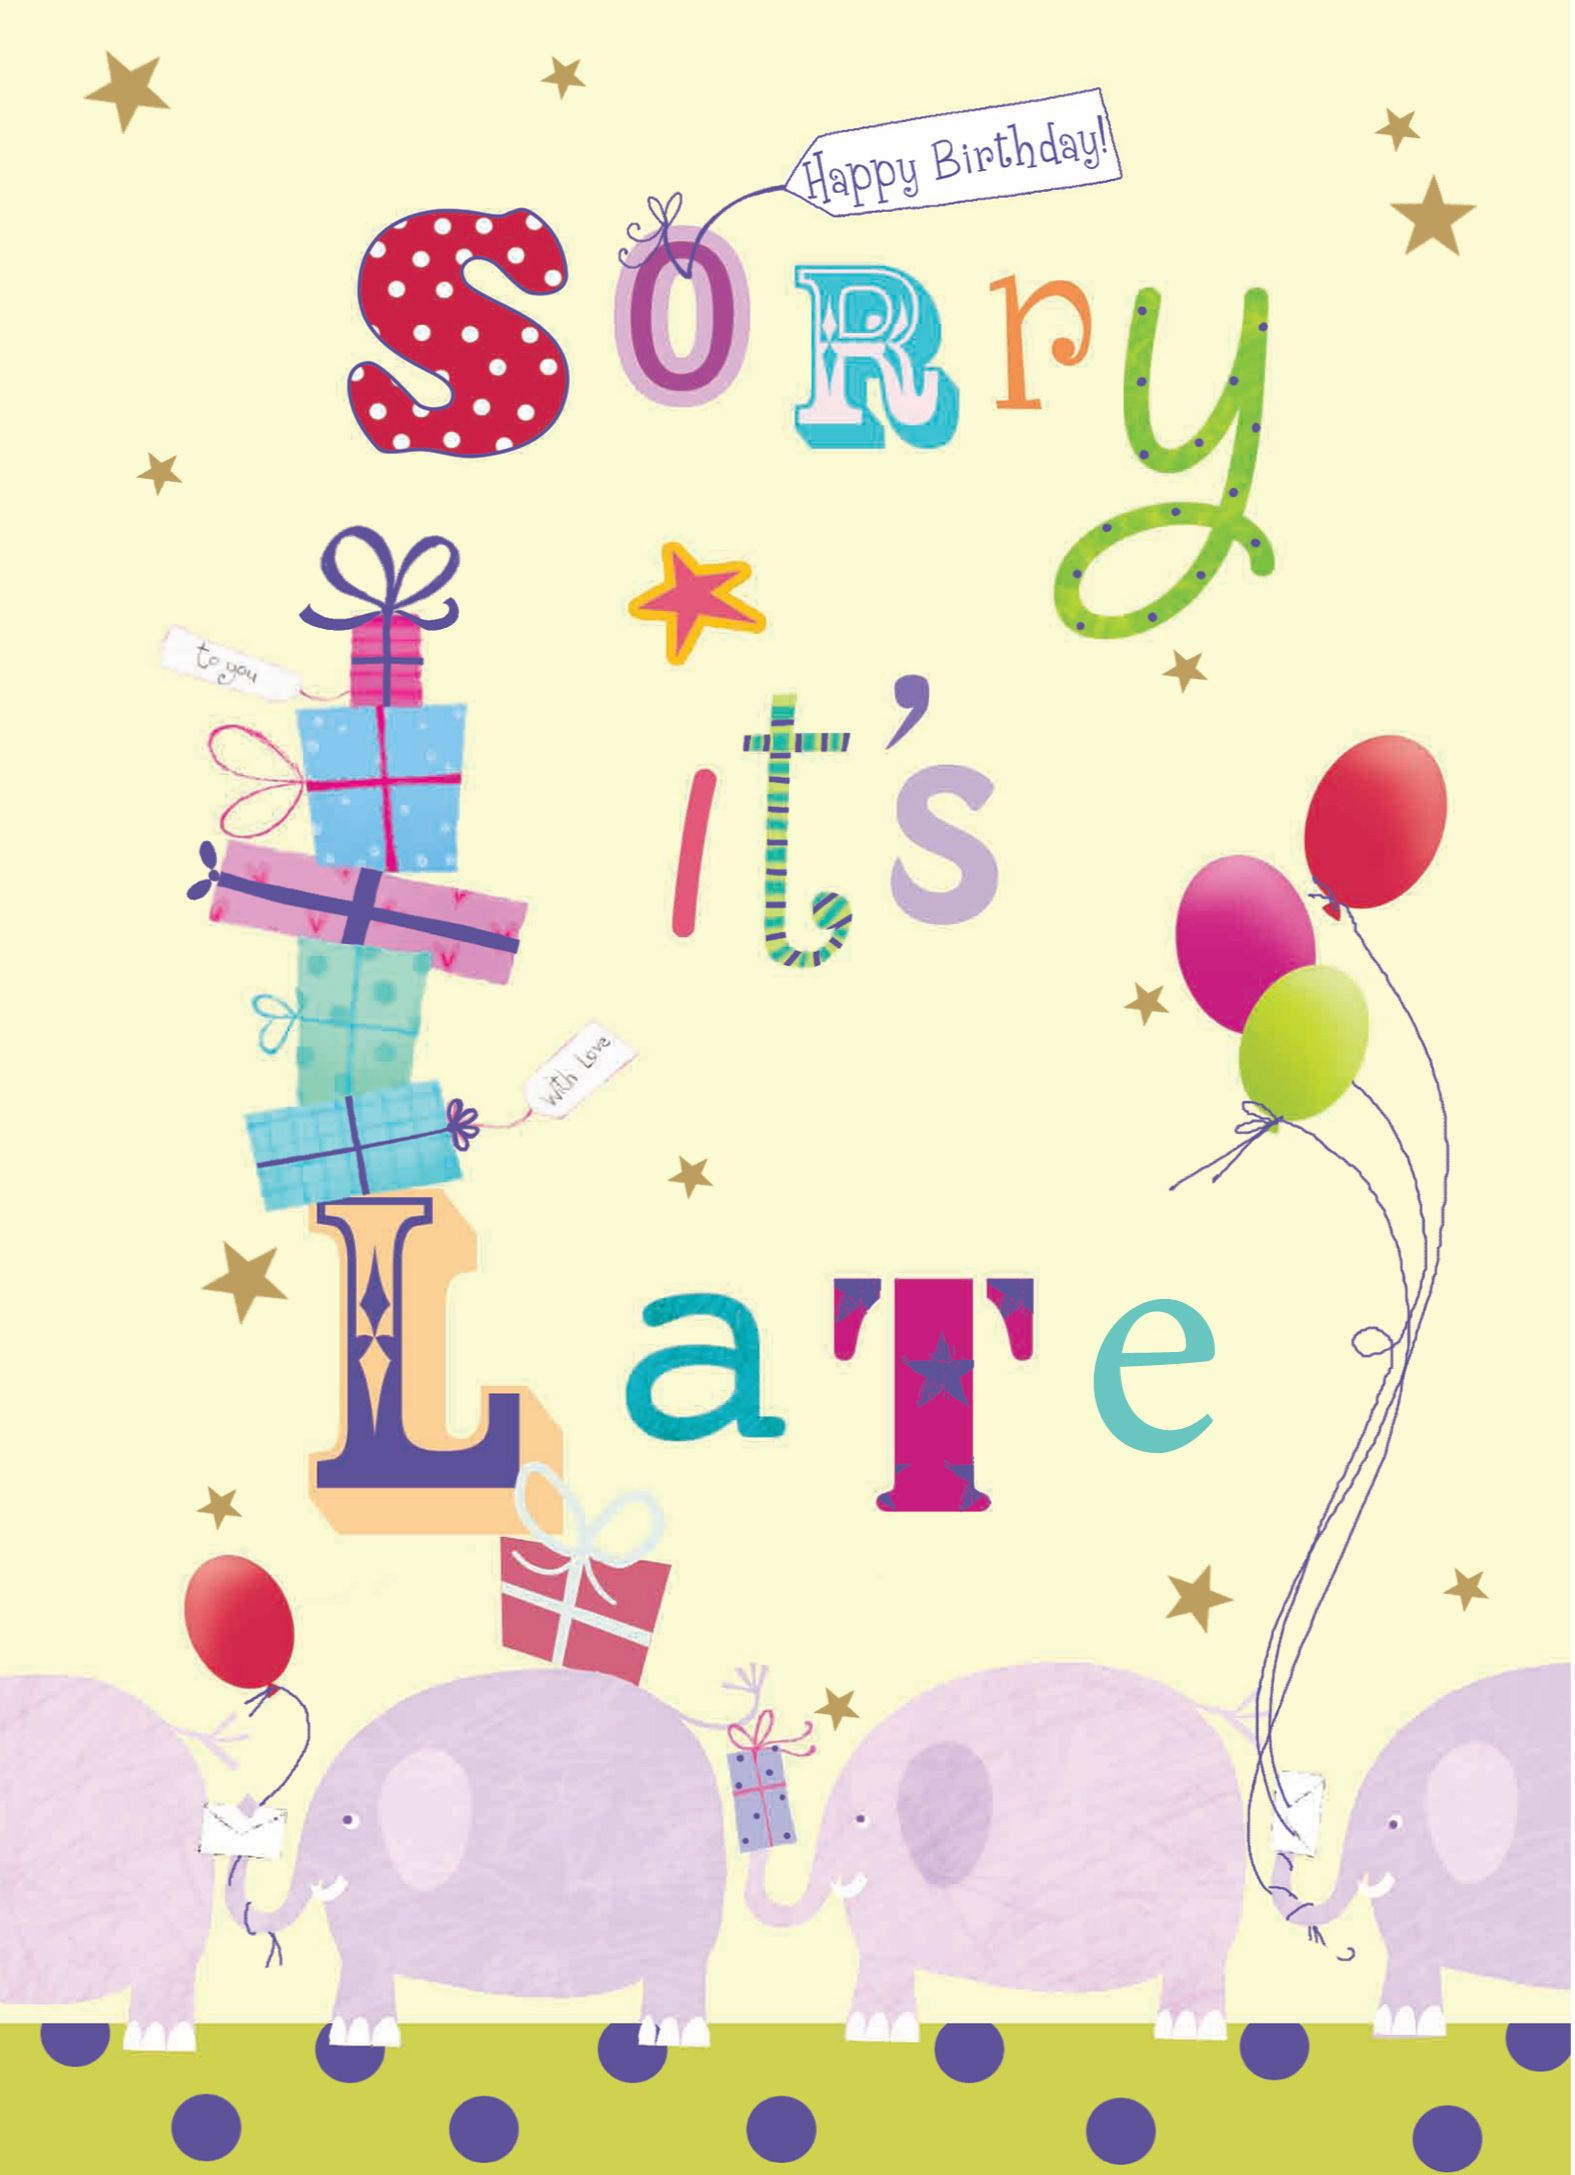 Late birthday wishes. Late birthday wishes, Belated